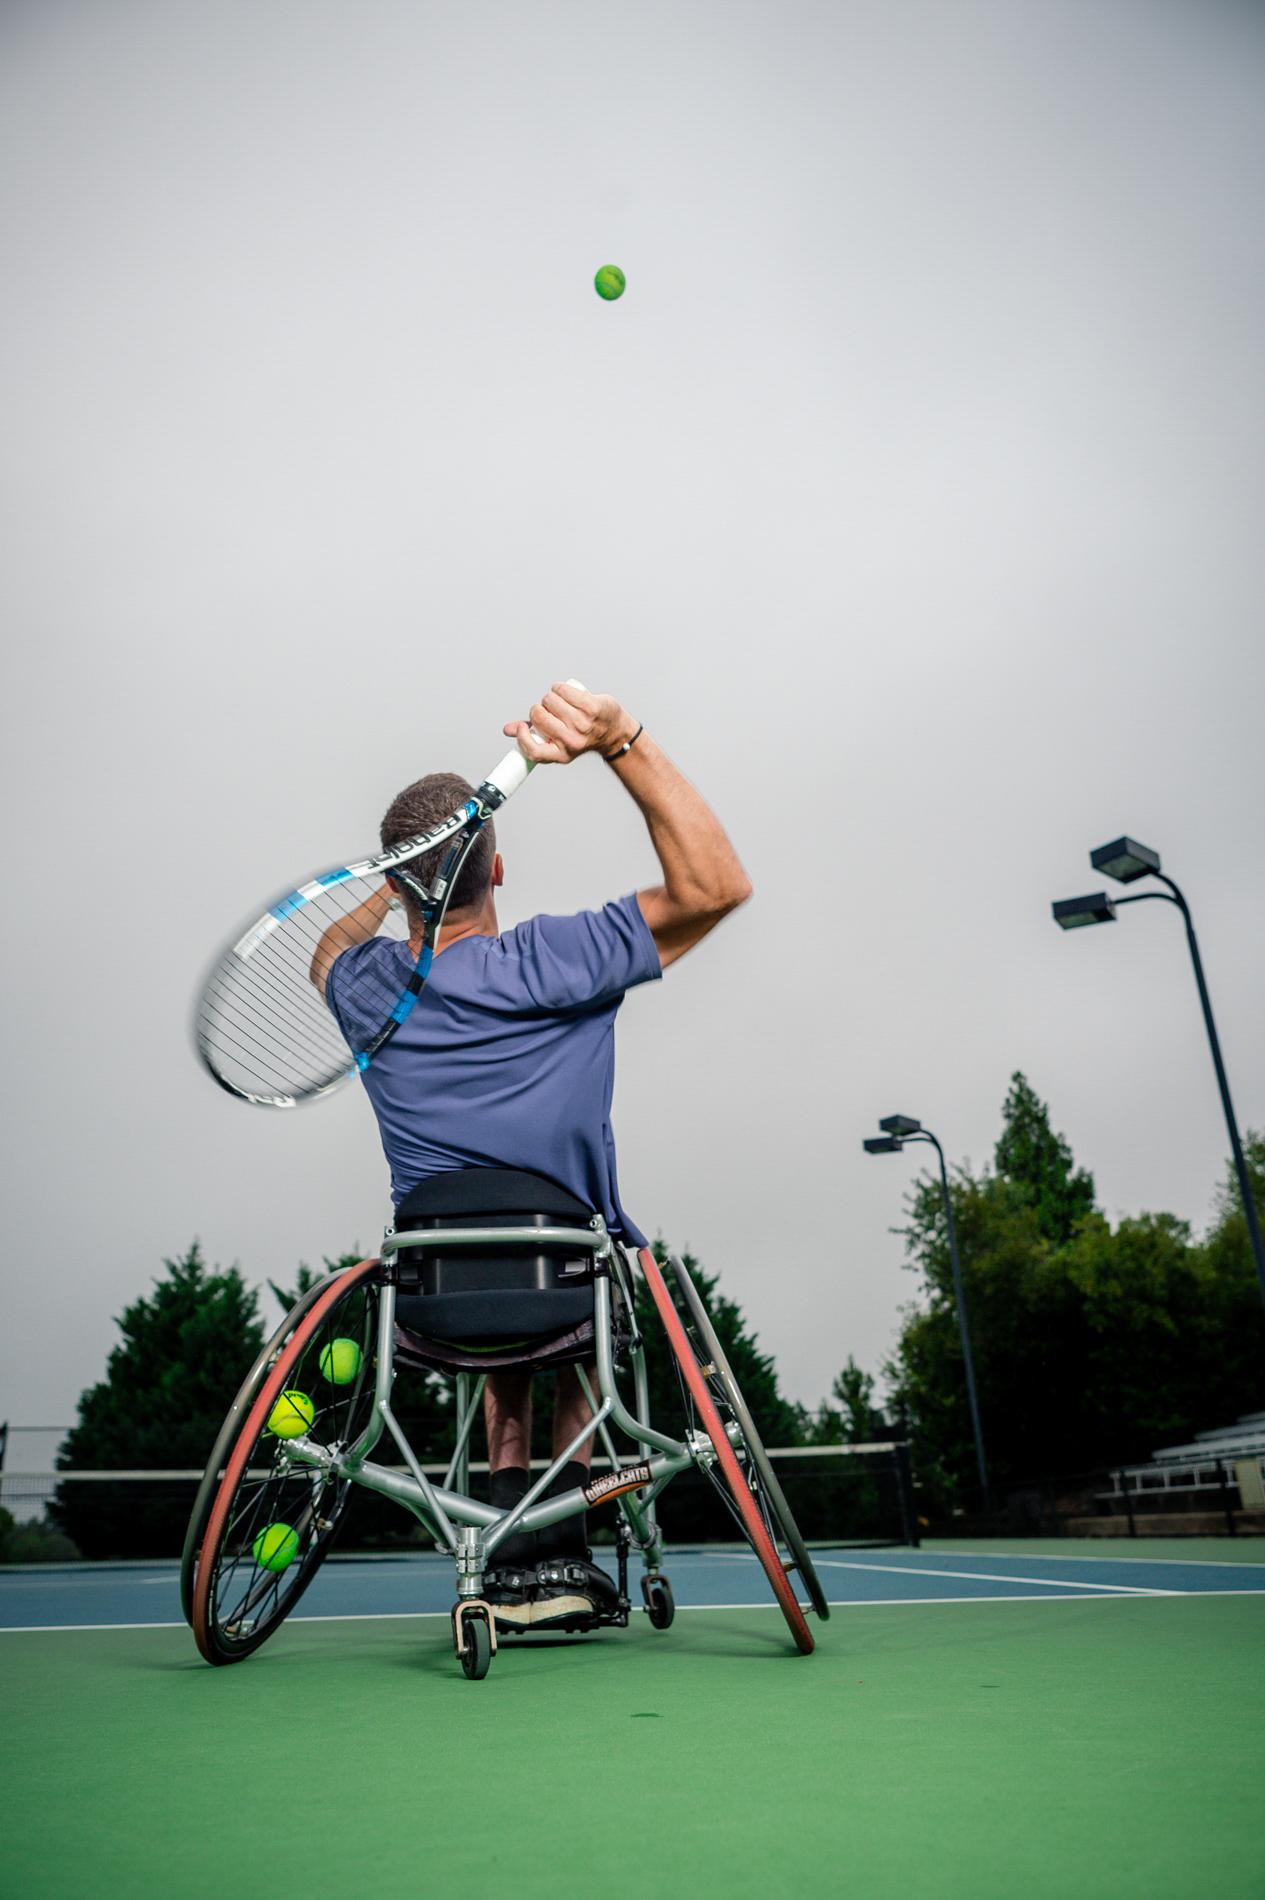 Rainy Day Tennis